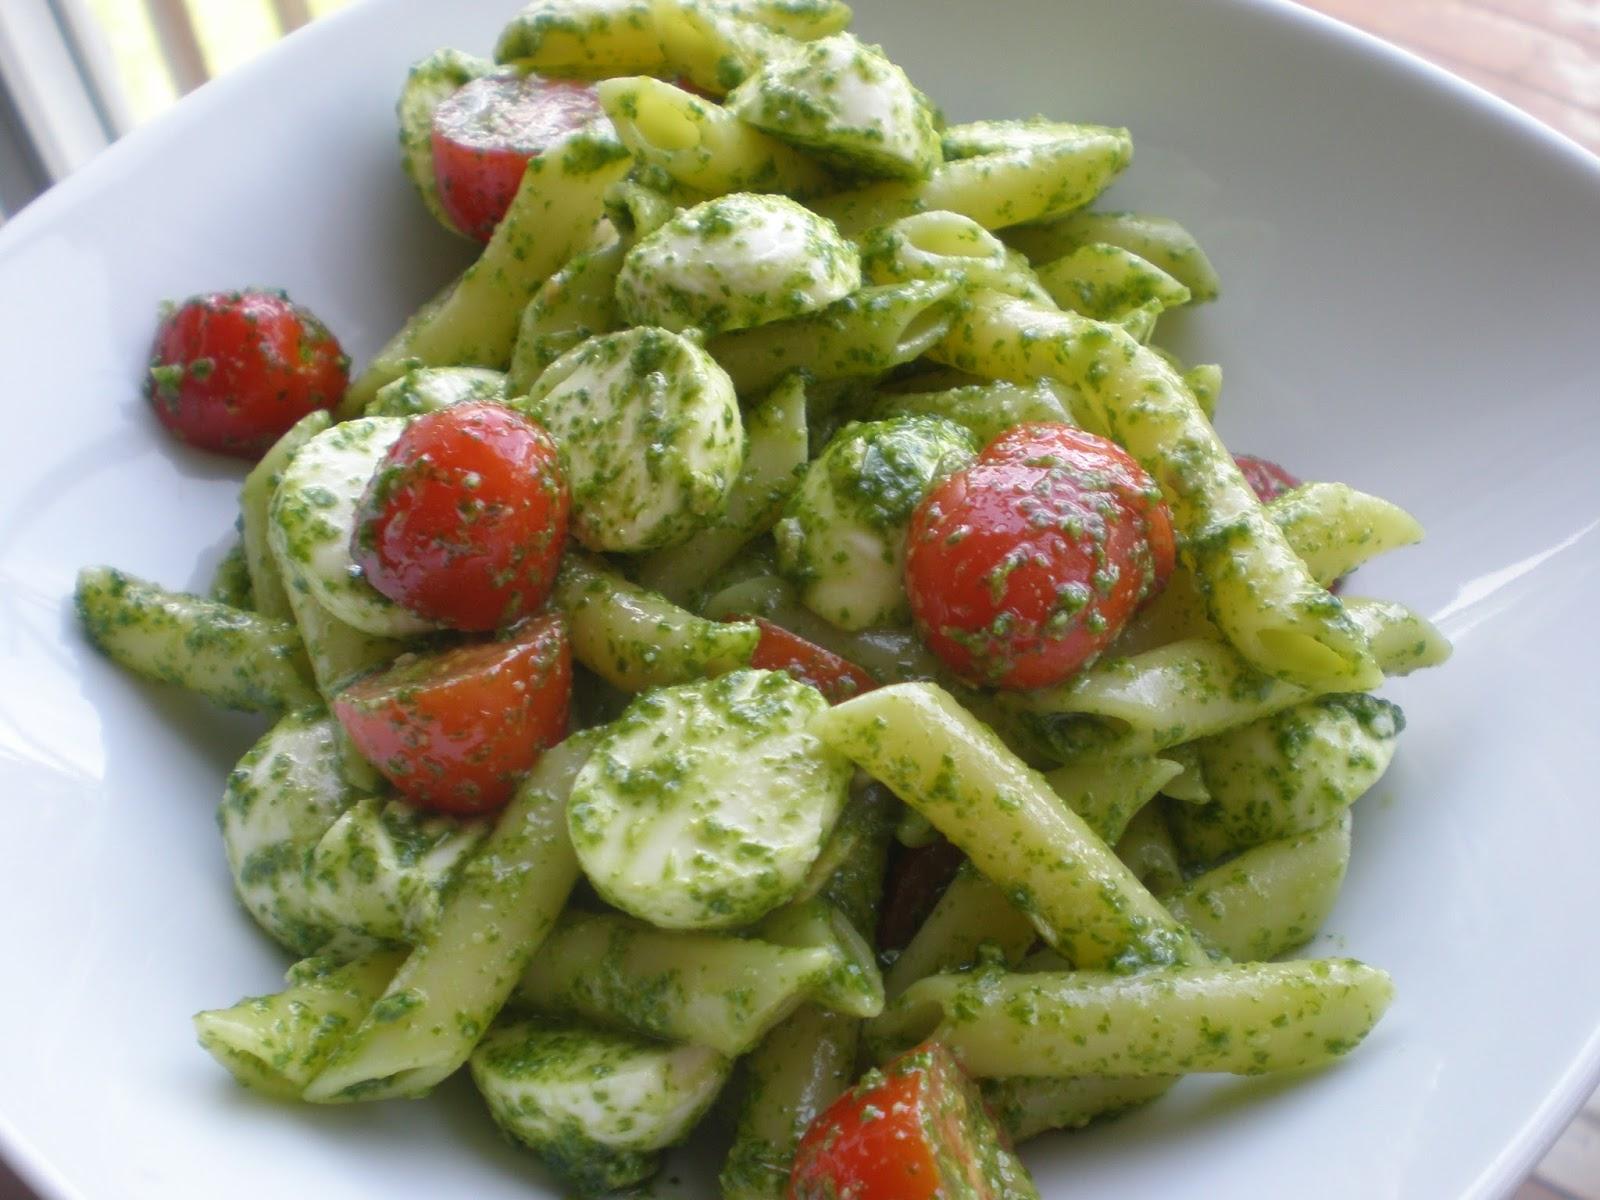 La cuisine de radisjoli - recettes et propos culinaires - Salade Pates Pesto